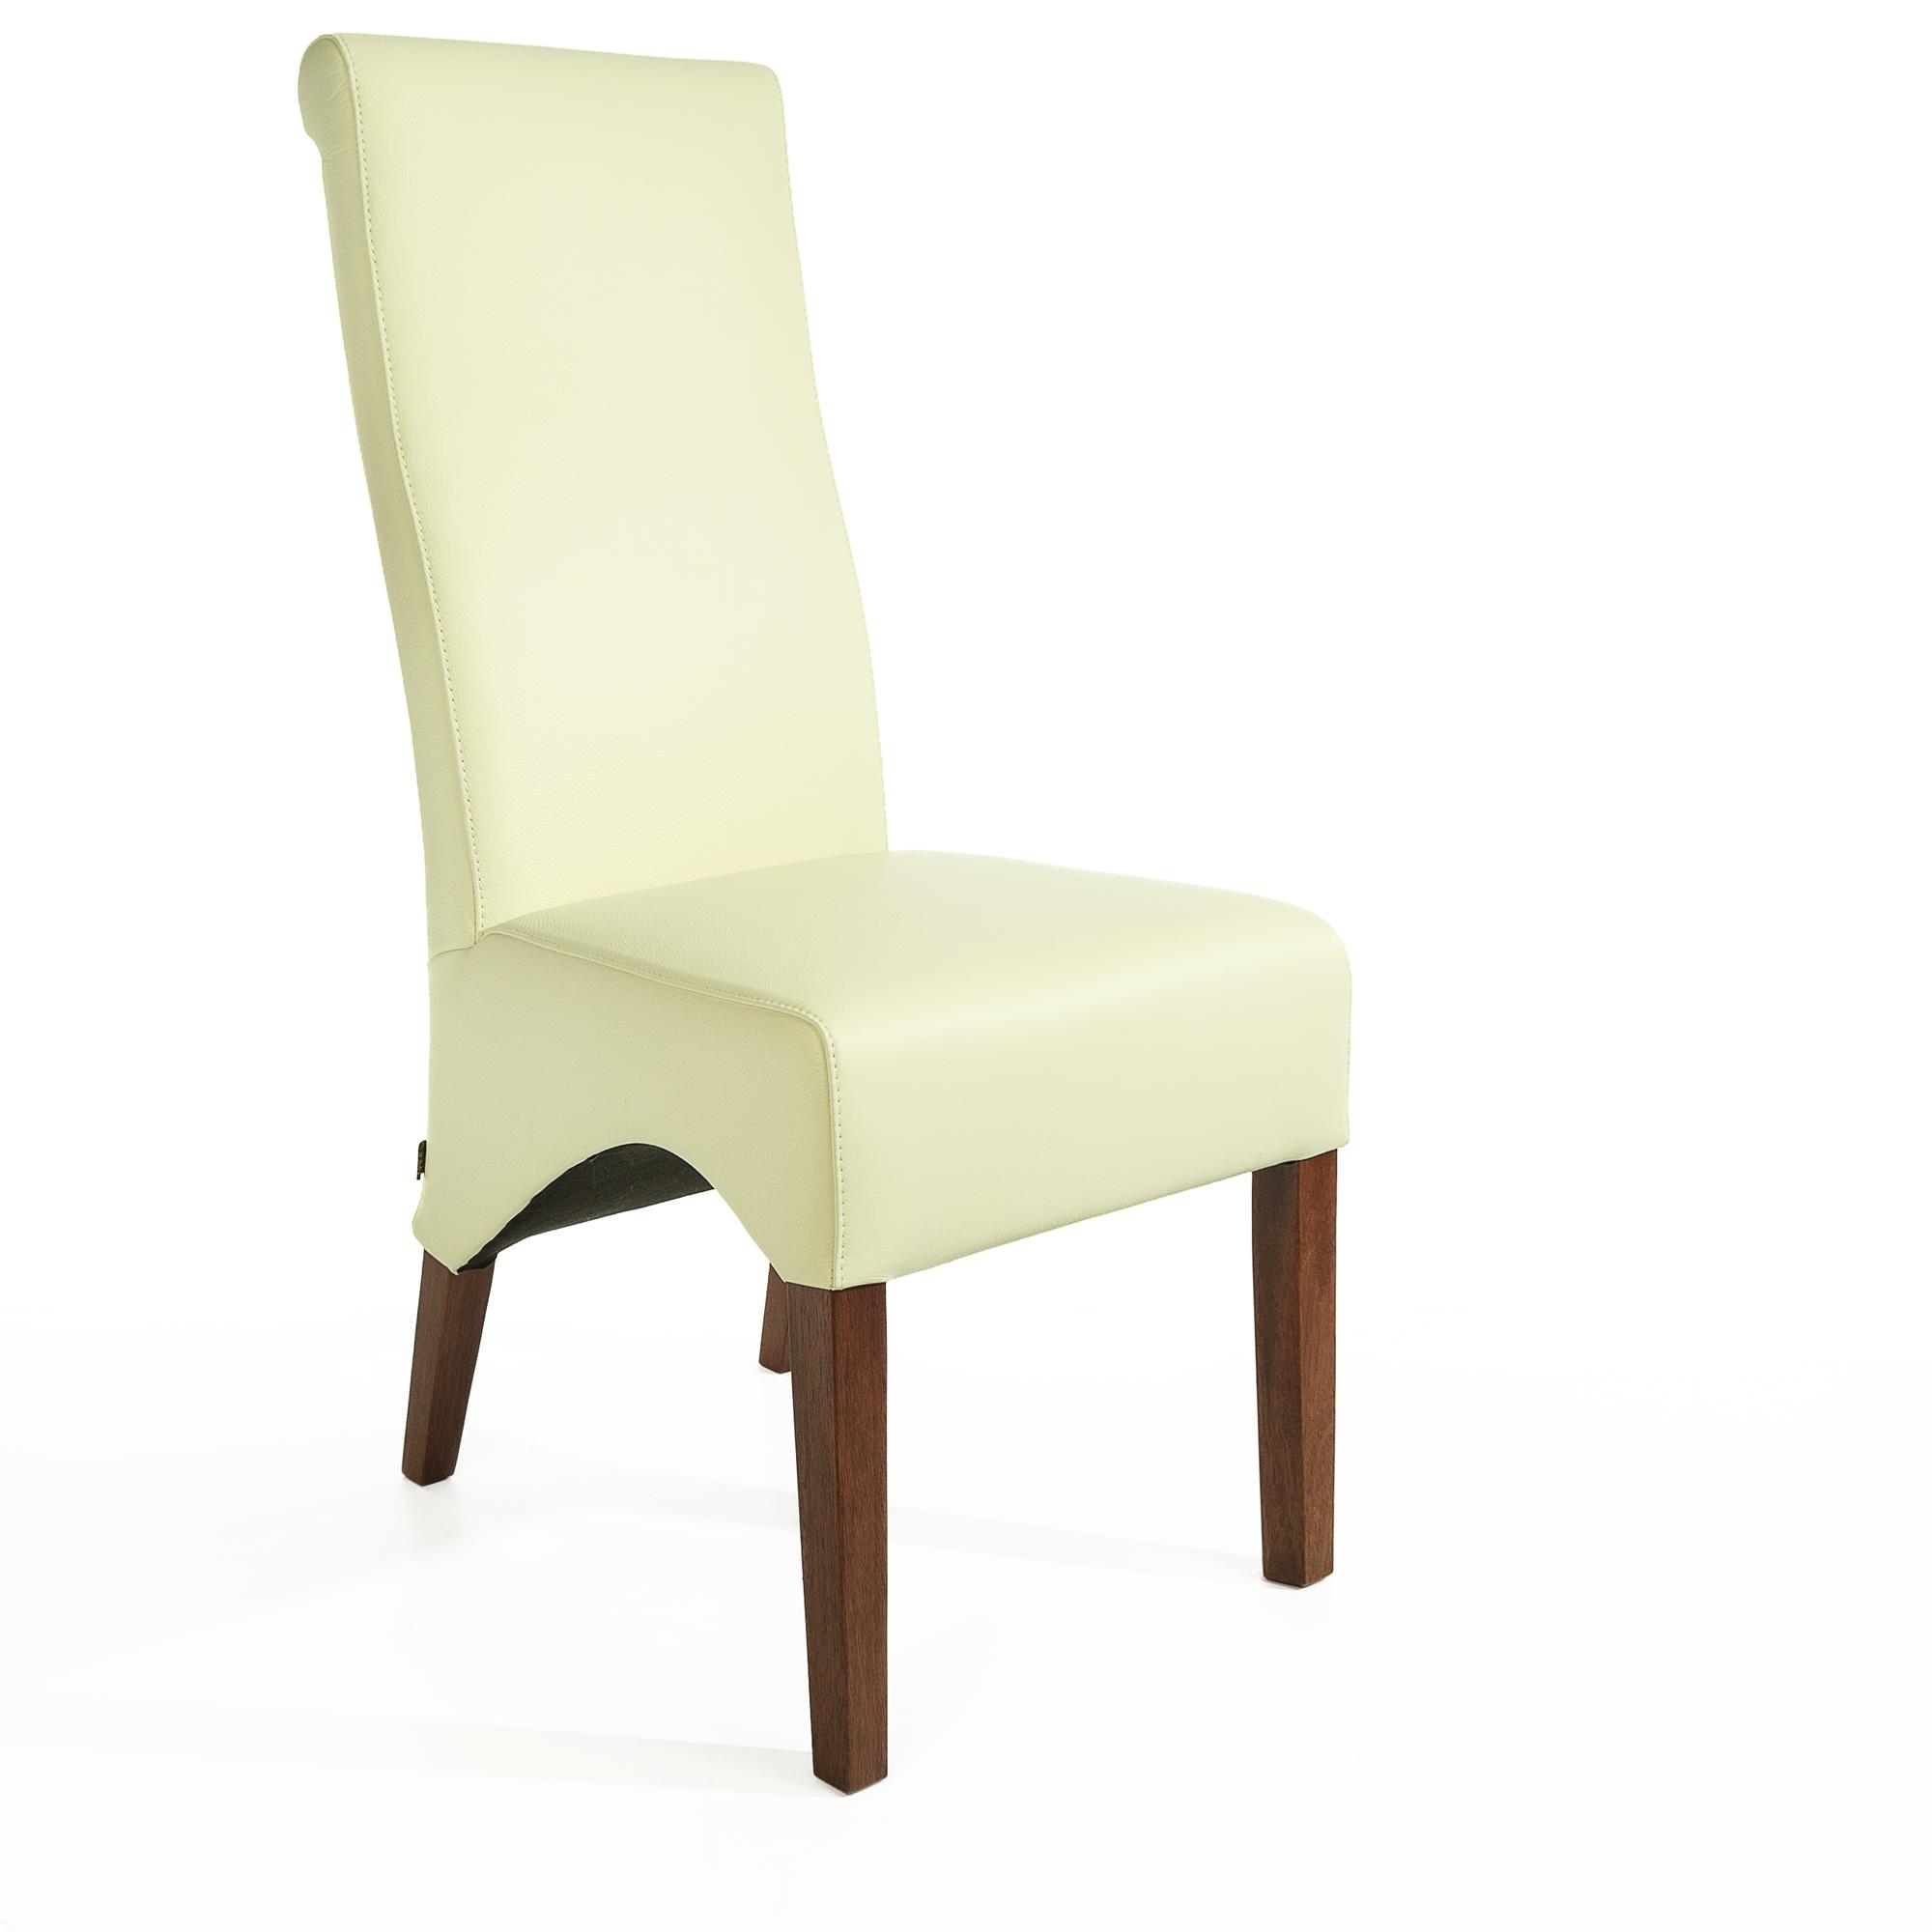 lederstuhl regina federkern creme wei nussbaum. Black Bedroom Furniture Sets. Home Design Ideas